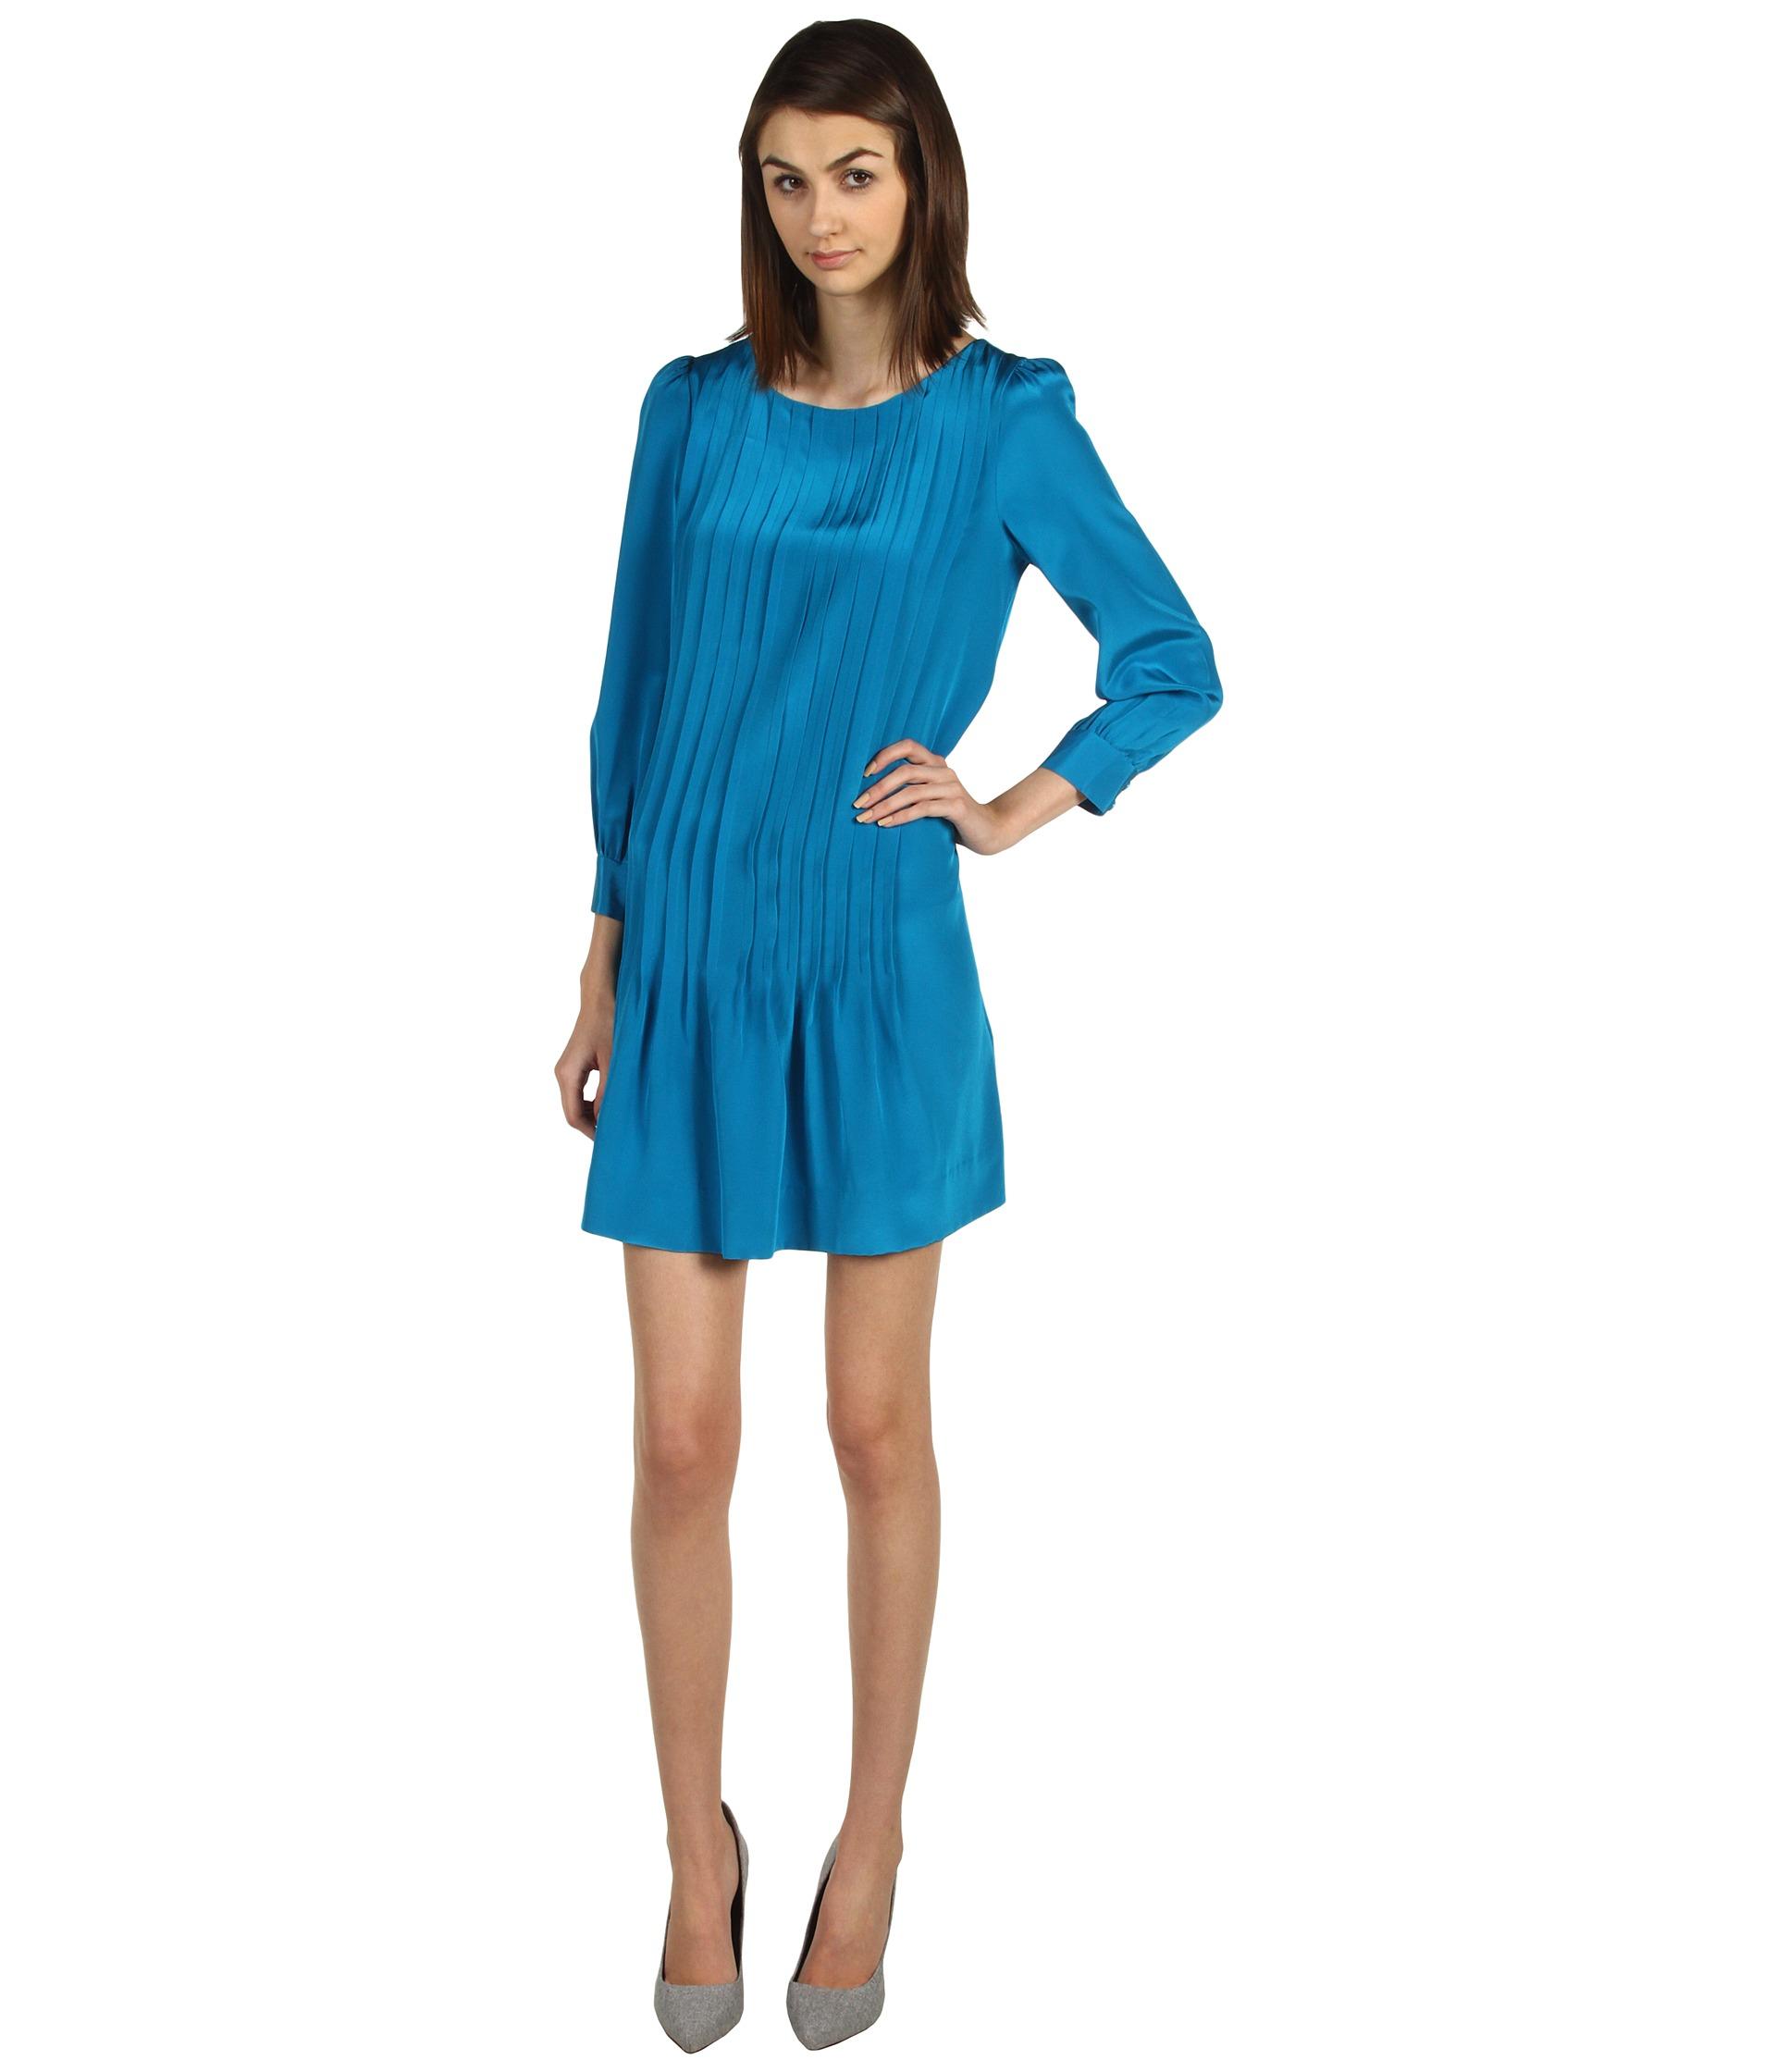 Kate Spade New York Arden Dress